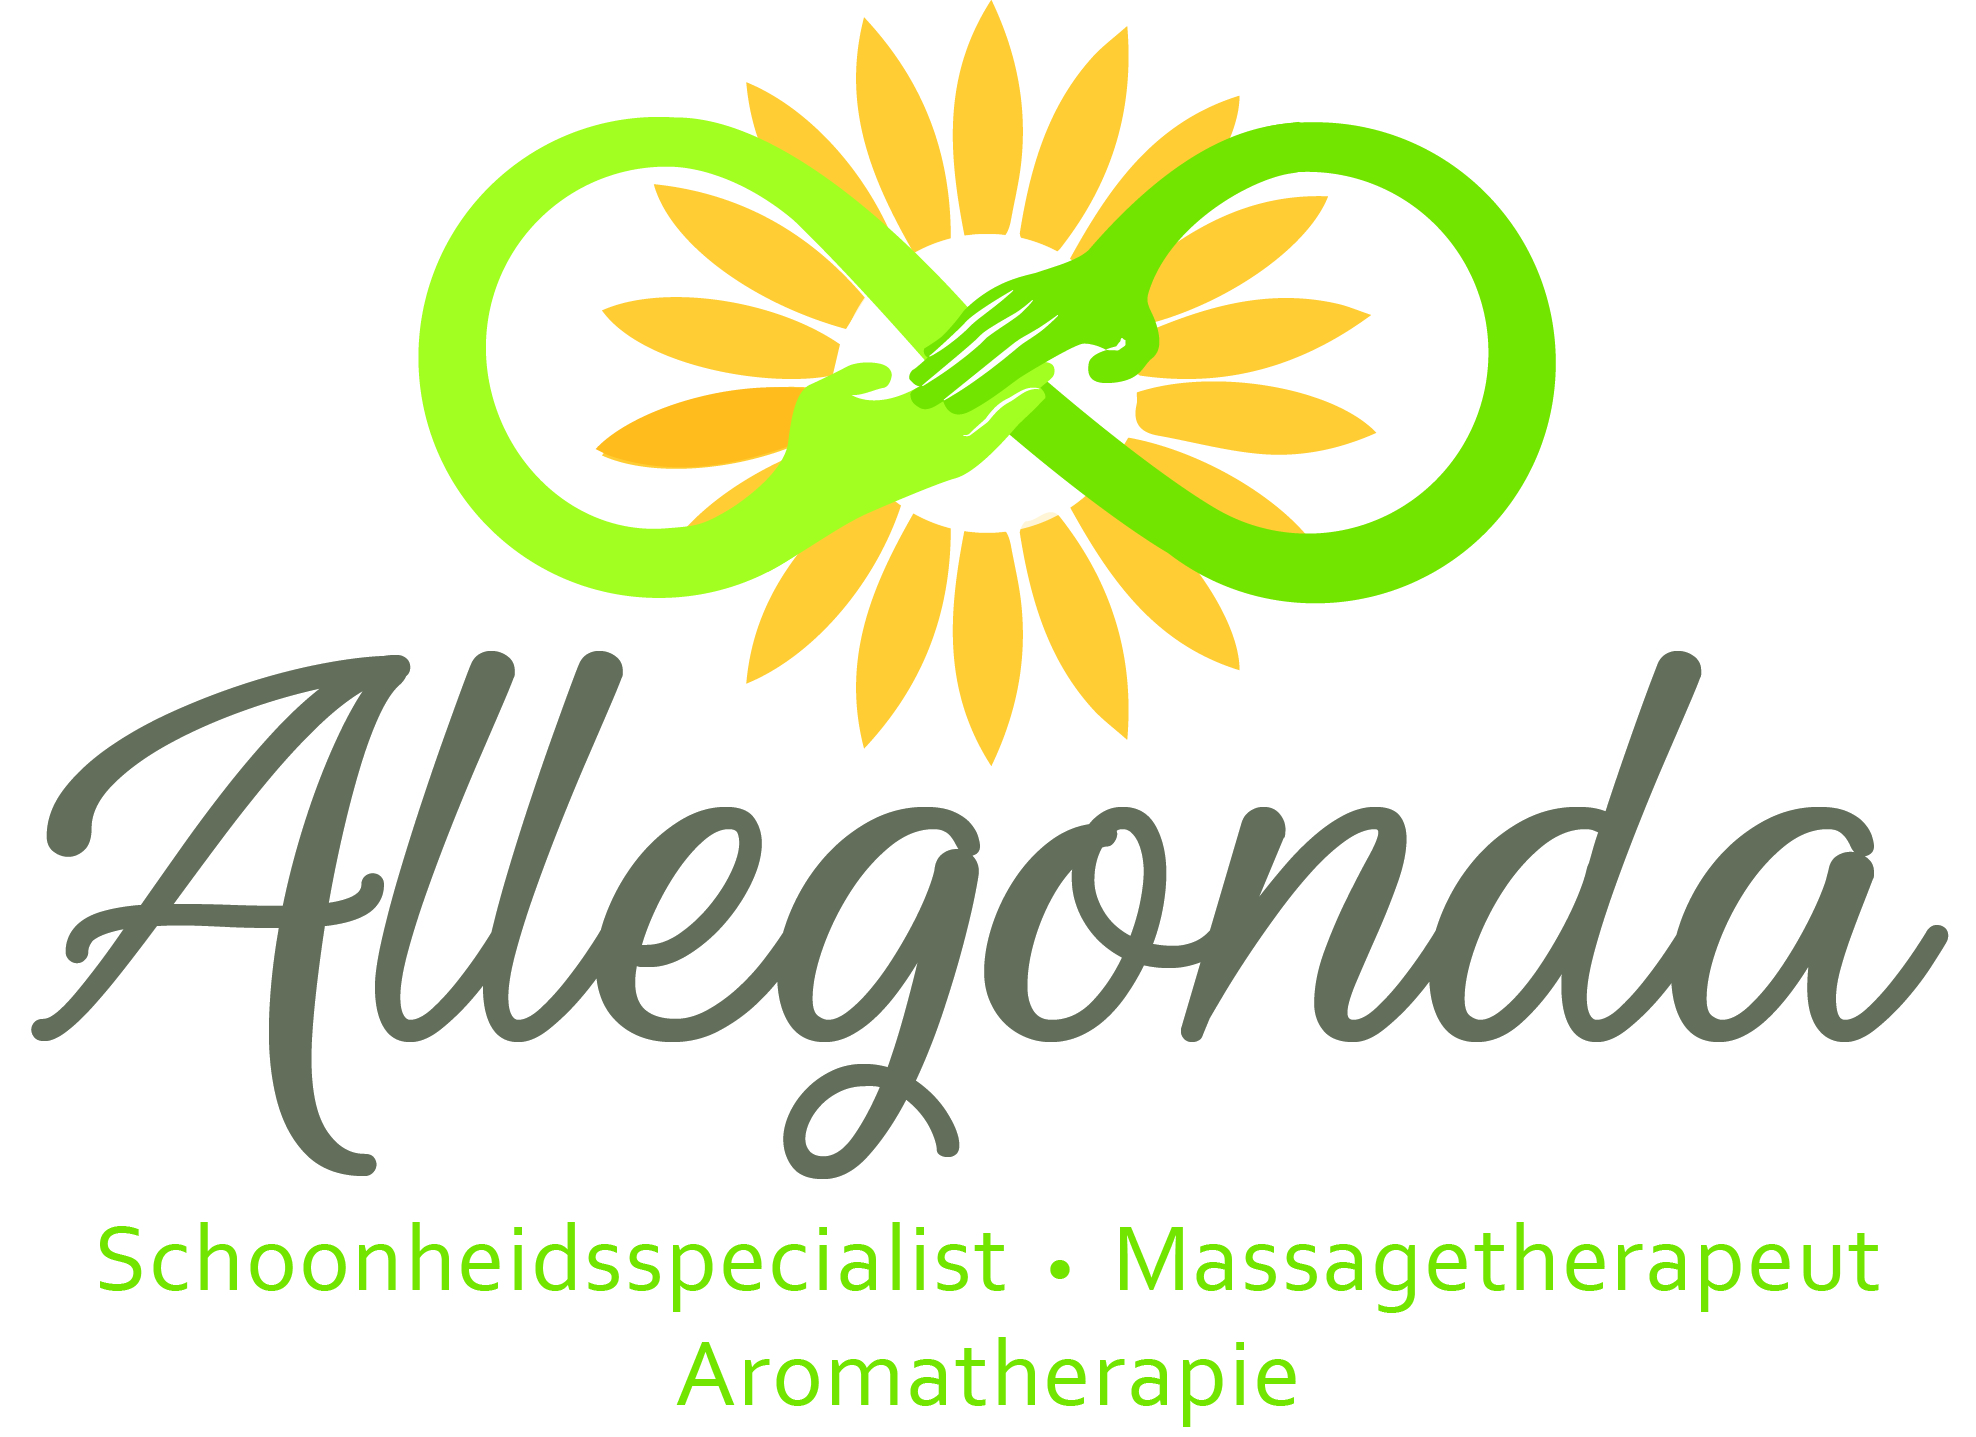 Allegonda - Schoonheidsspecialist | Massagetherapeut | Aromatherapie | Chi